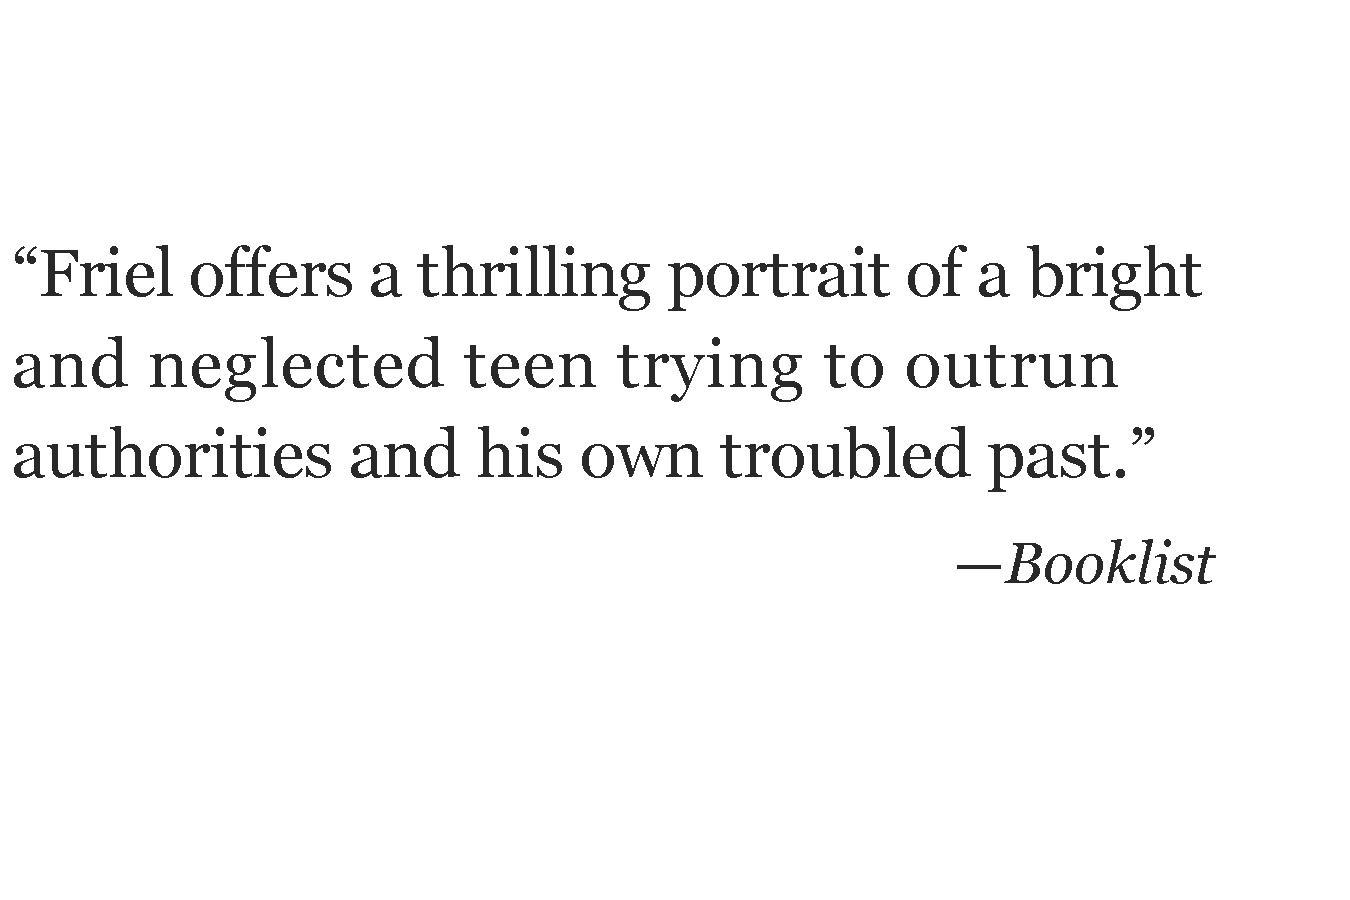 booklist-quote2